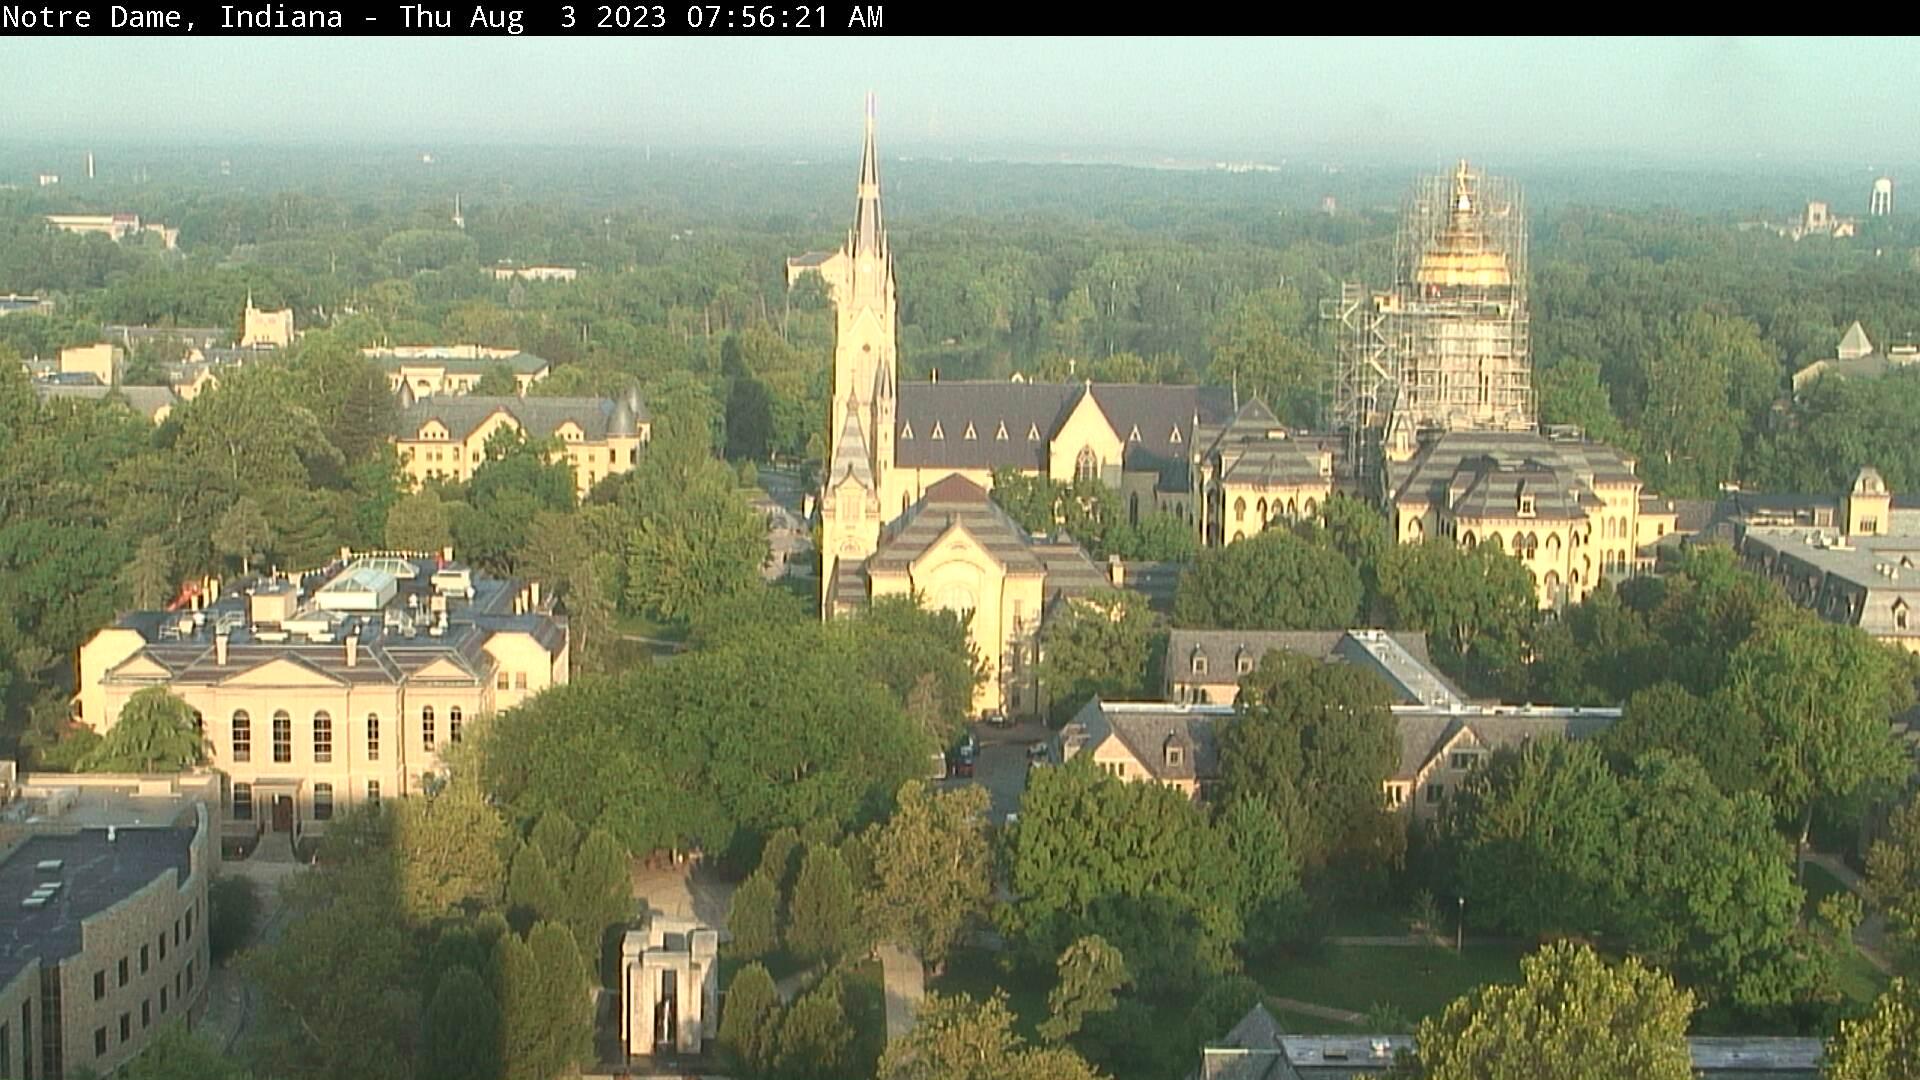 Notre Dame, Indiana Sat. 07:56